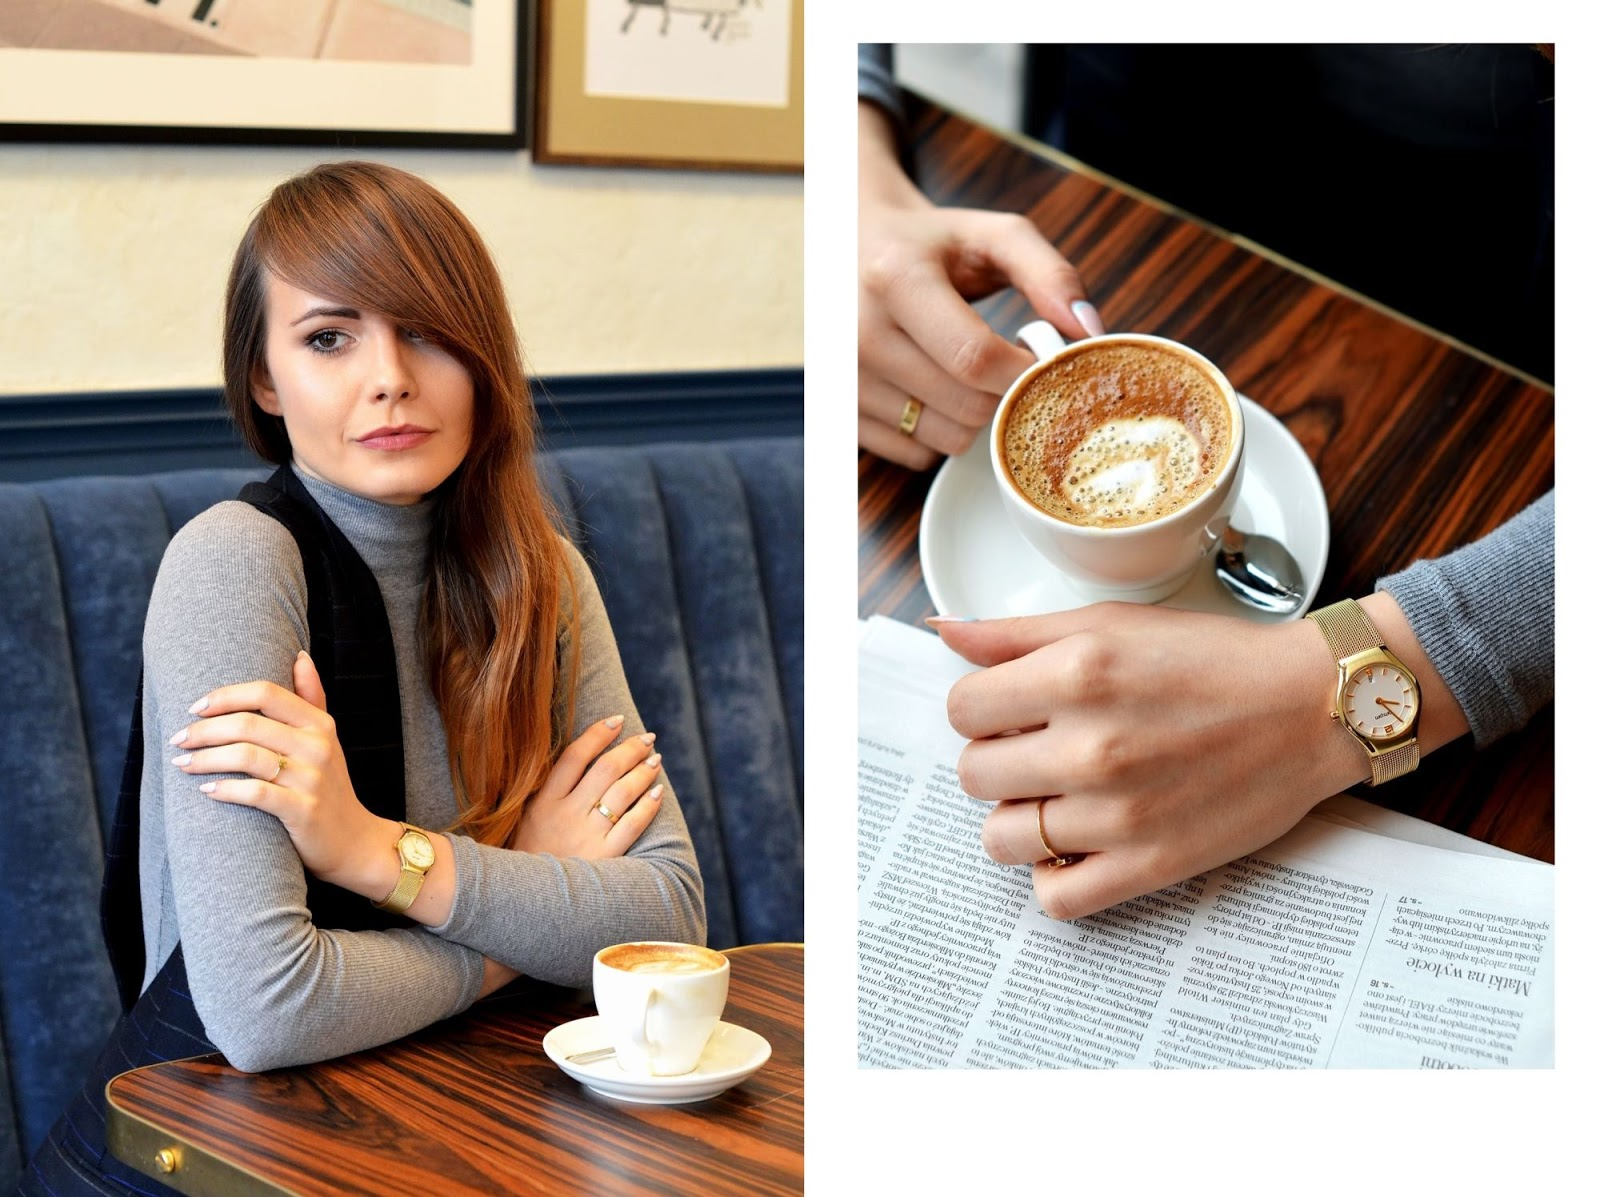 bizuteria dla kobiet | apart | zegarek ampm | kobiecosc | dzien kobiet